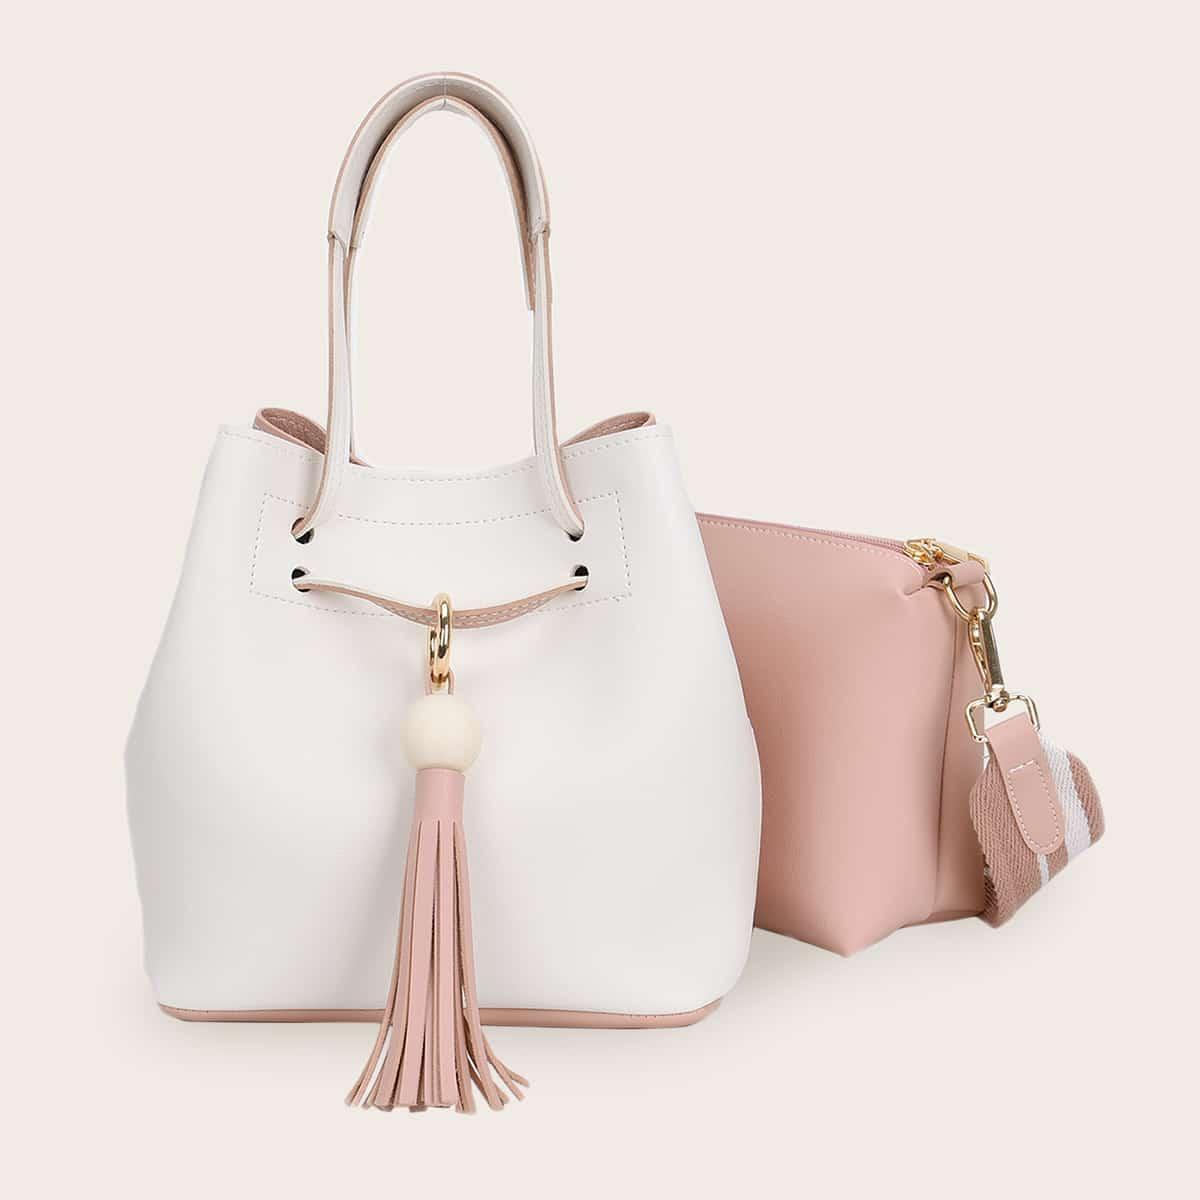 2pcs Tassel Decor Tote Bag With Crossbody Bag